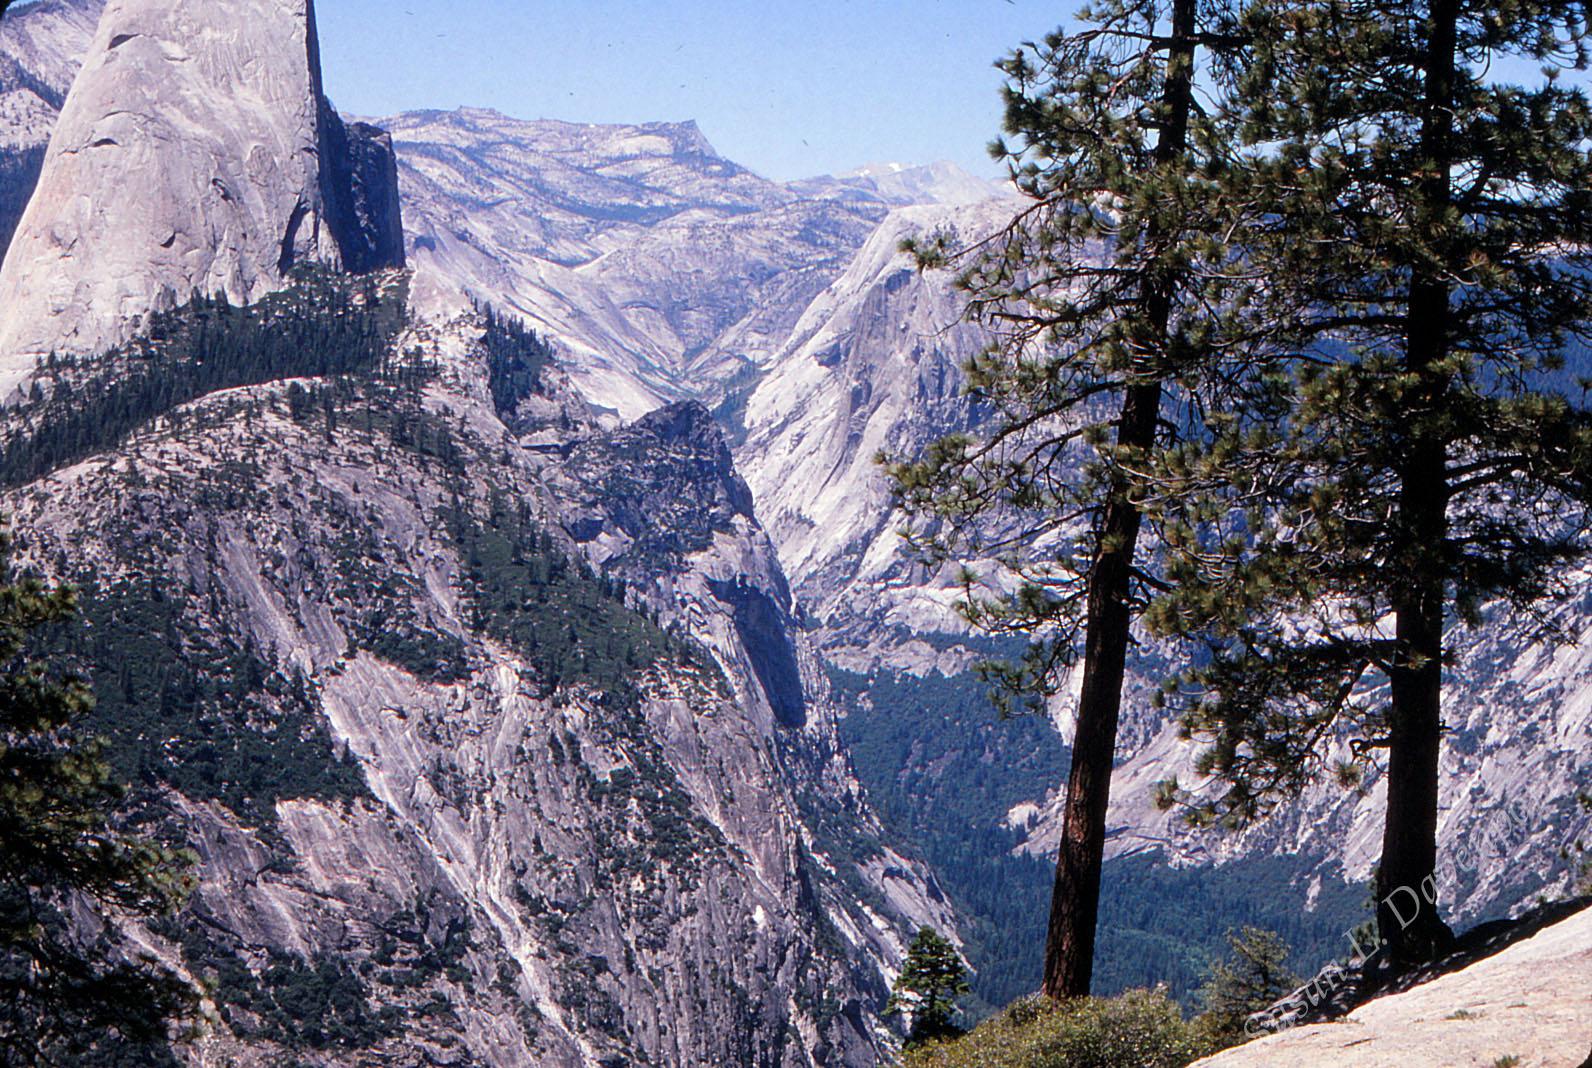 Yosemite: Half-Dome